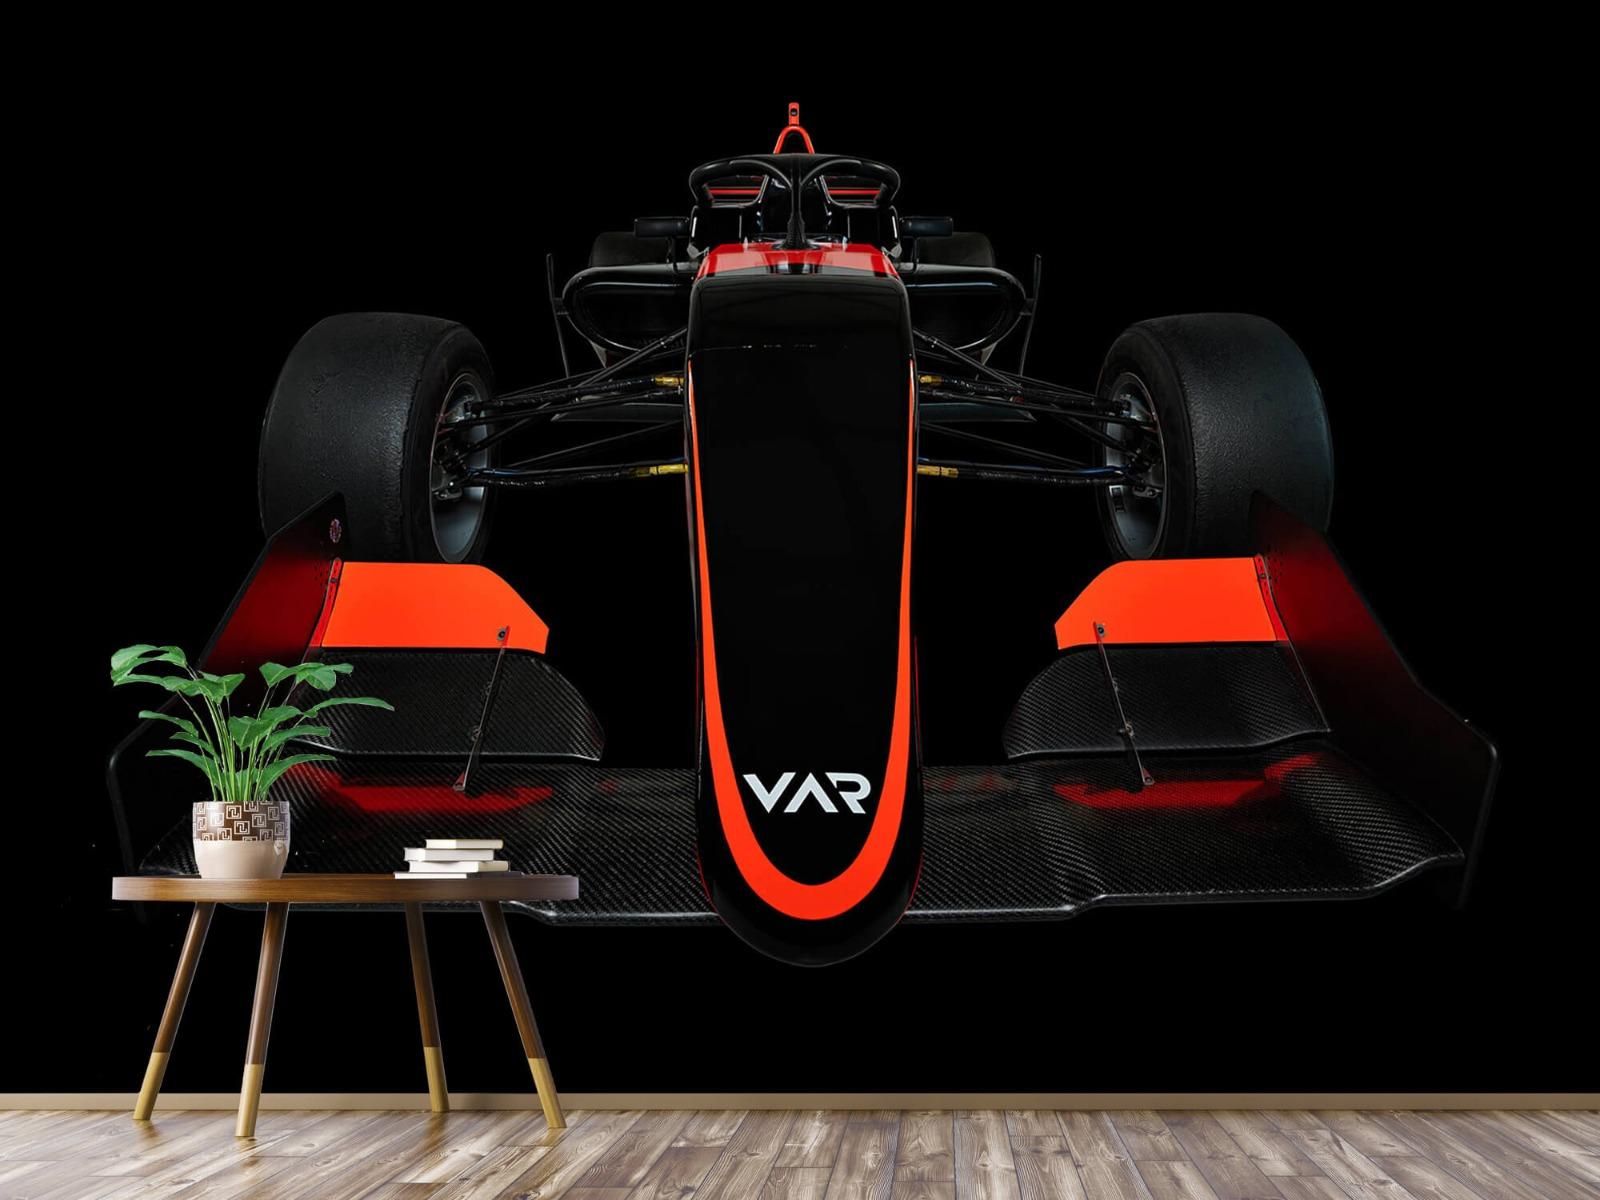 Sportauto's - Formule 3 - Lower front view - dark - Slaapkamer 4